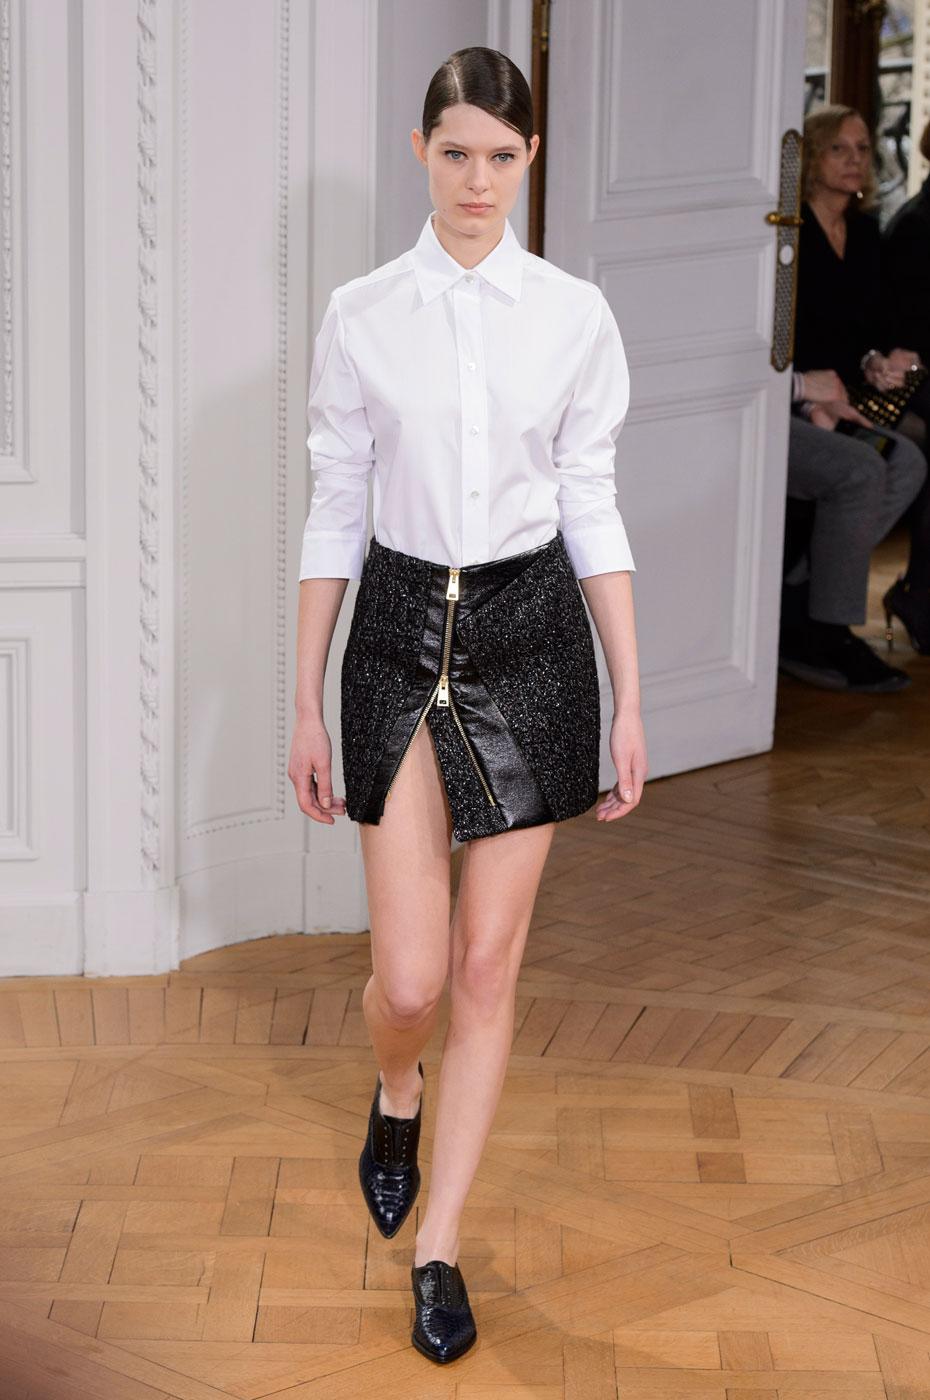 Bouchra-Jarrar-fashion-runway-show-haute-couture-paris-spring-summer-2015-the-impression-31